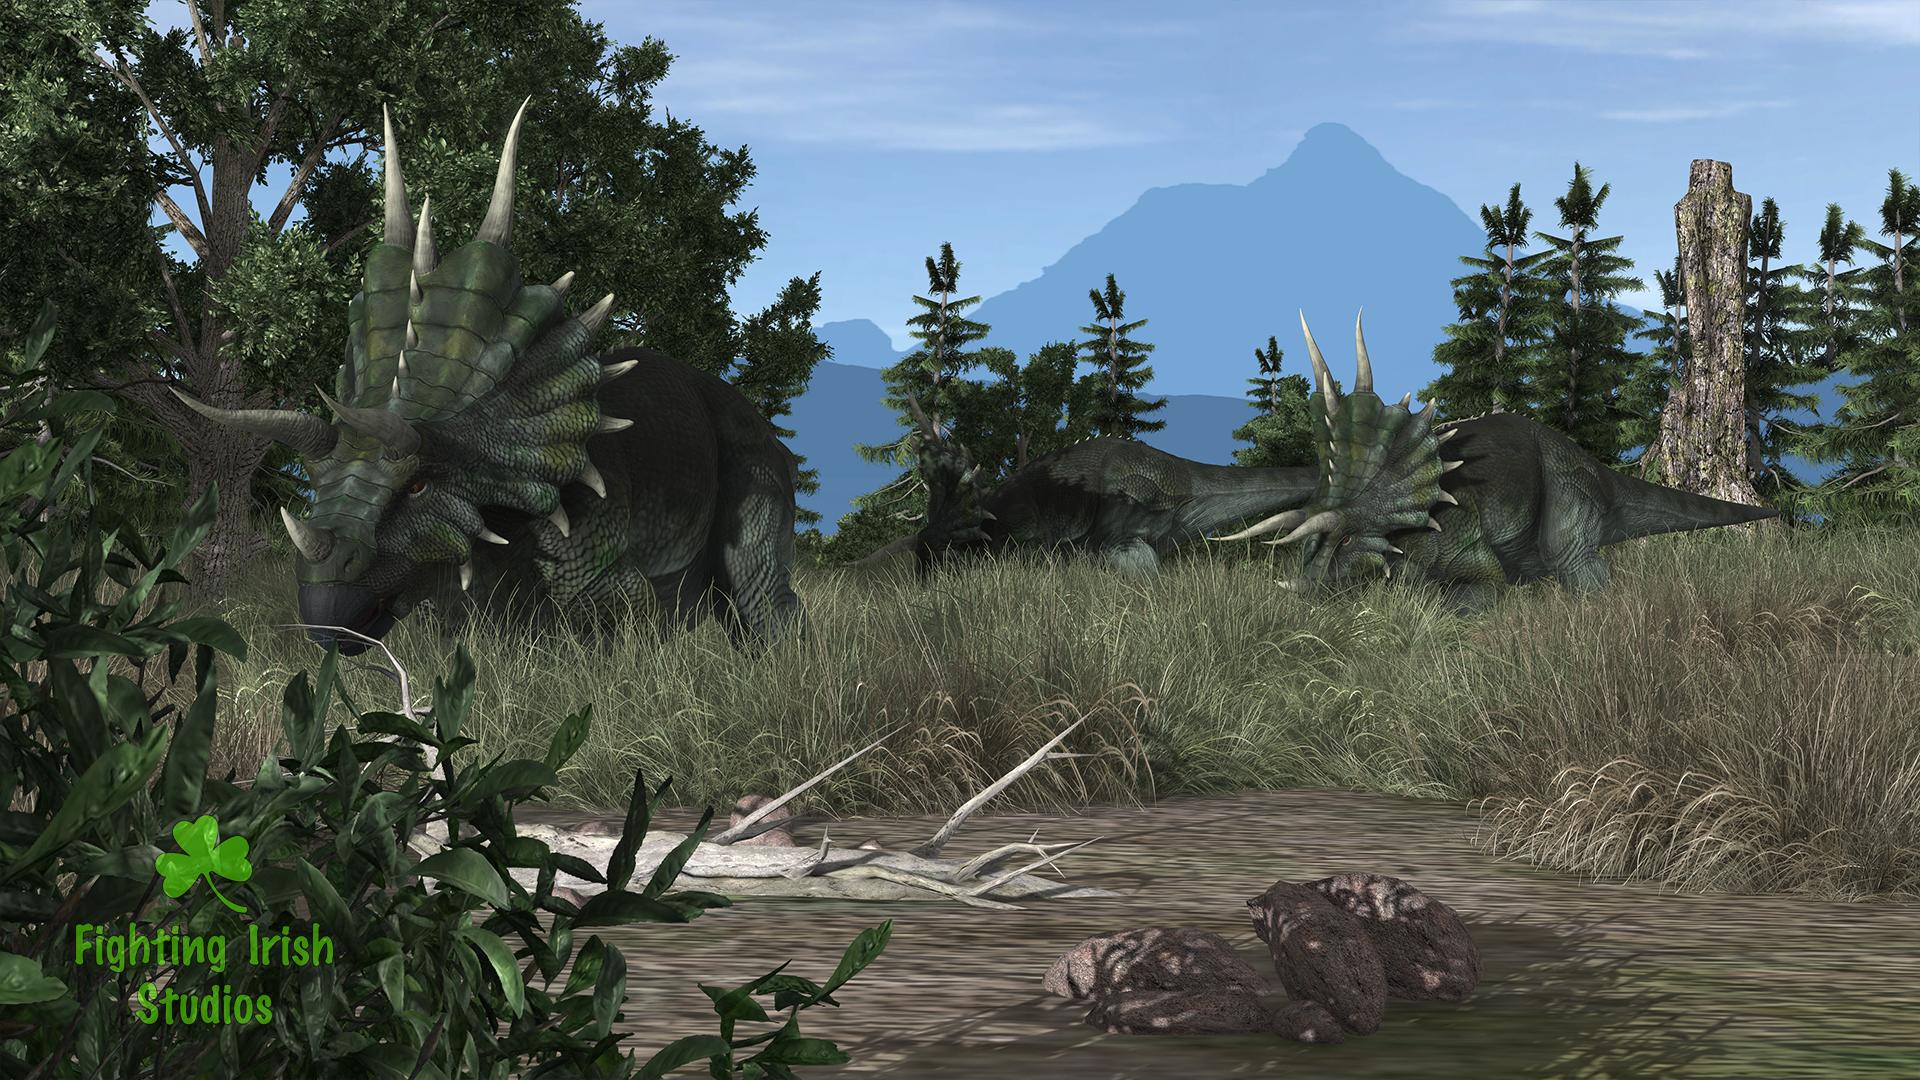 Dinosaur -- 2D & 3D animation Services Fighting Irish Studios